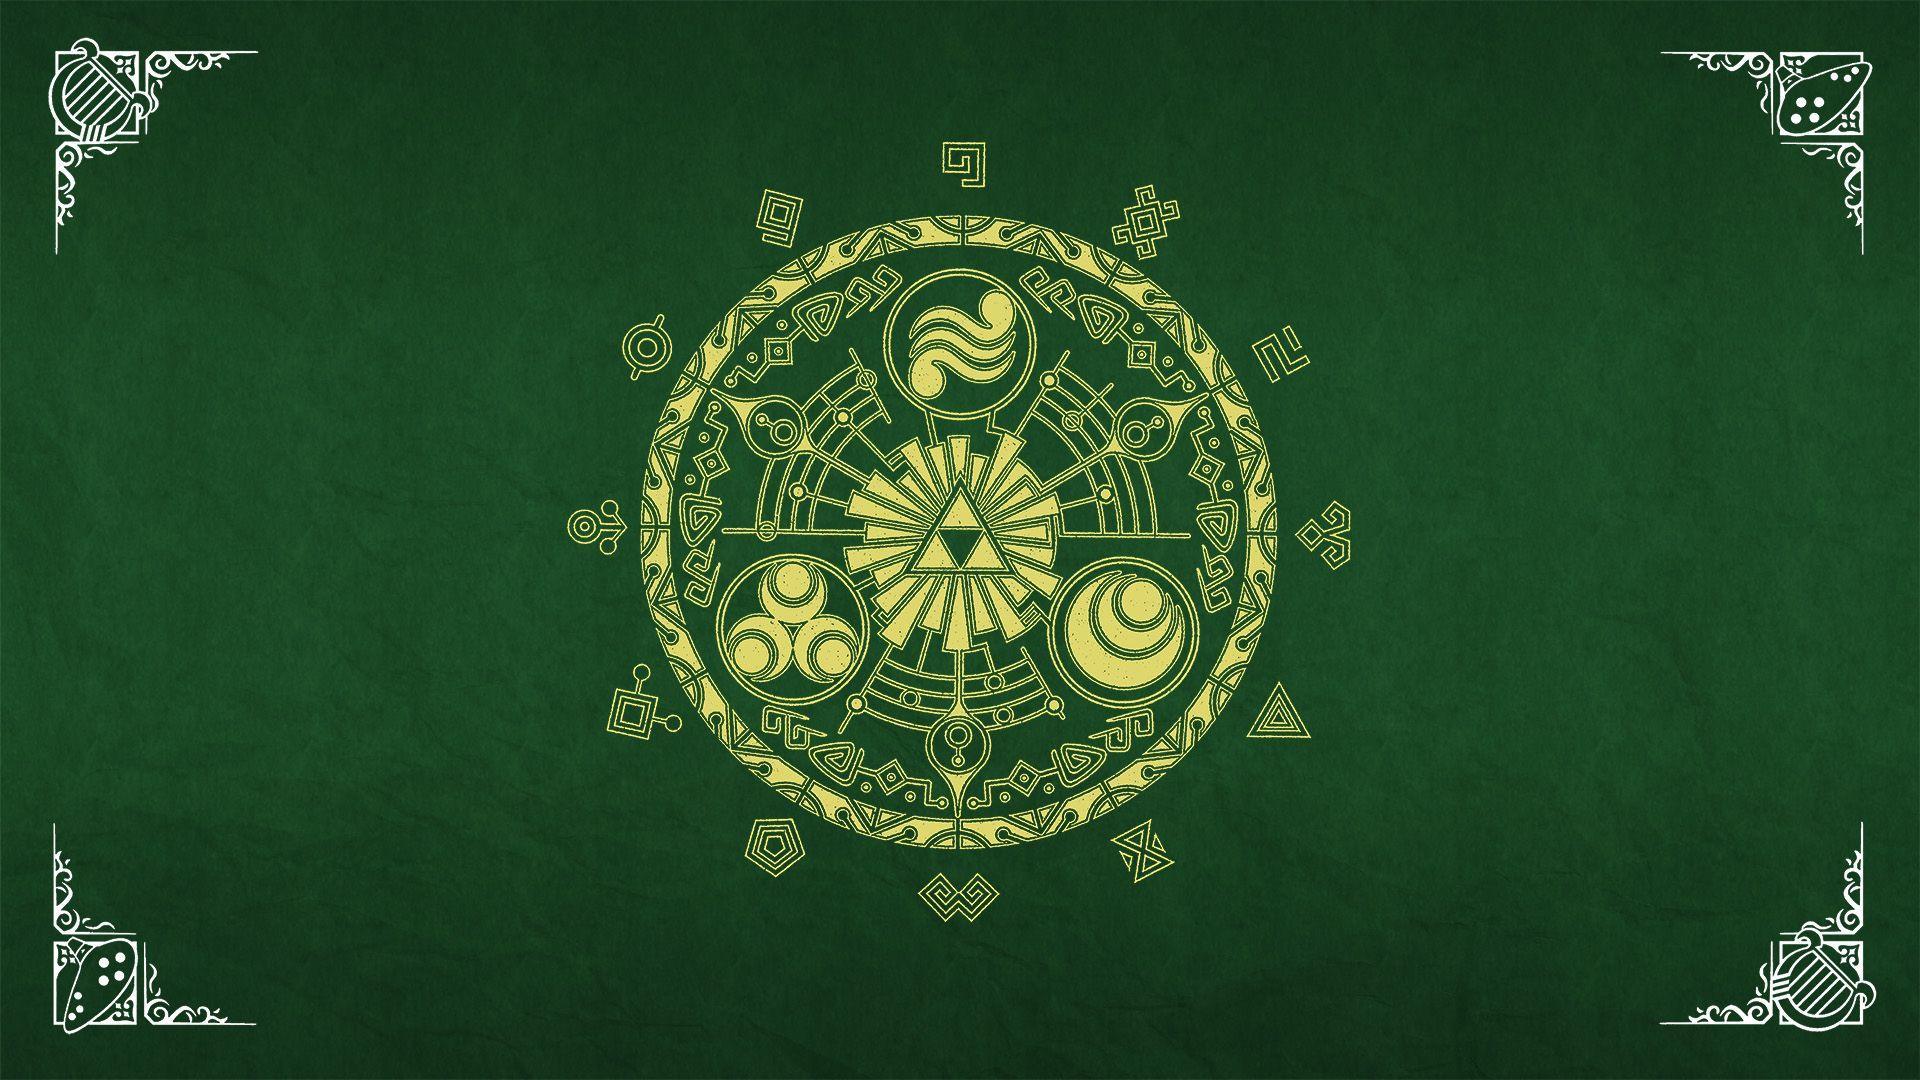 Legend Of Zelda Backgrounds Triforce Wallpaper Cave